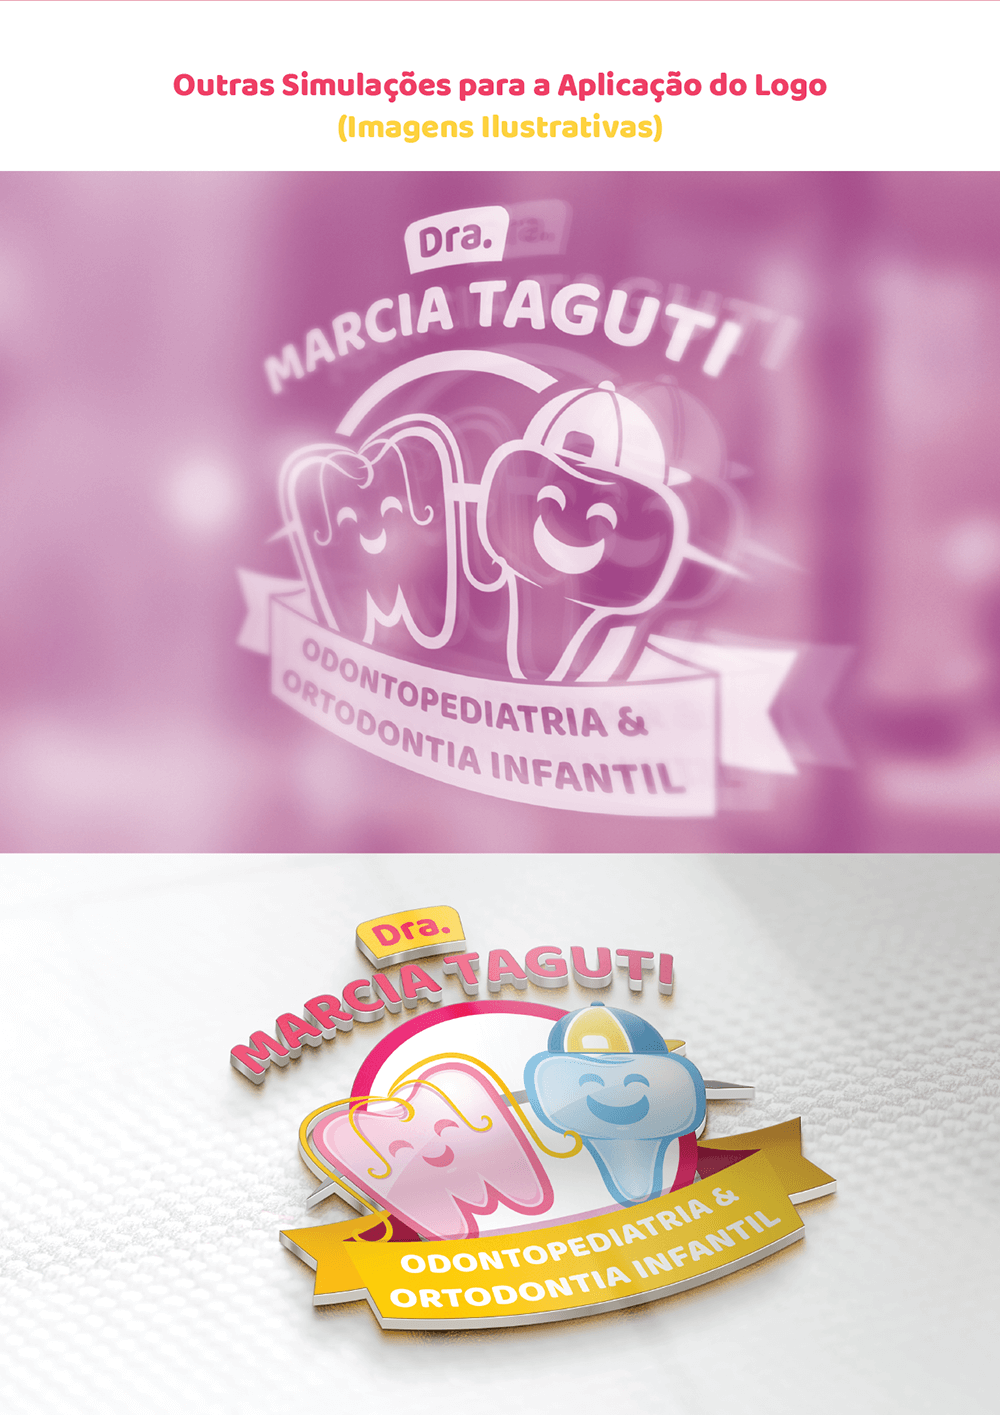 apresentacao-id-visual-dra-marcia-taguti-10